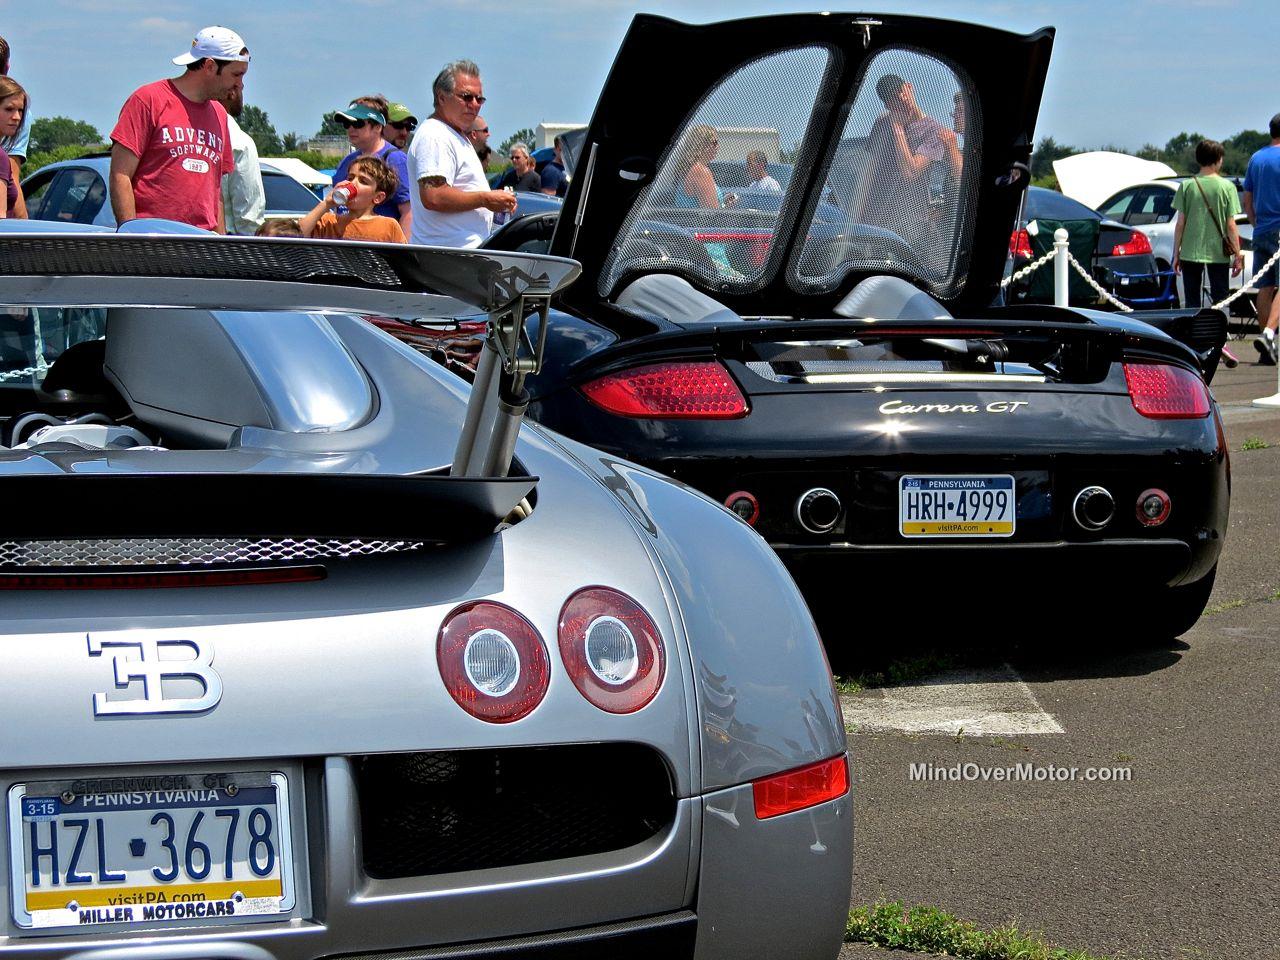 Bugatti Veyron and Porsche Carrera GT at CF Charities